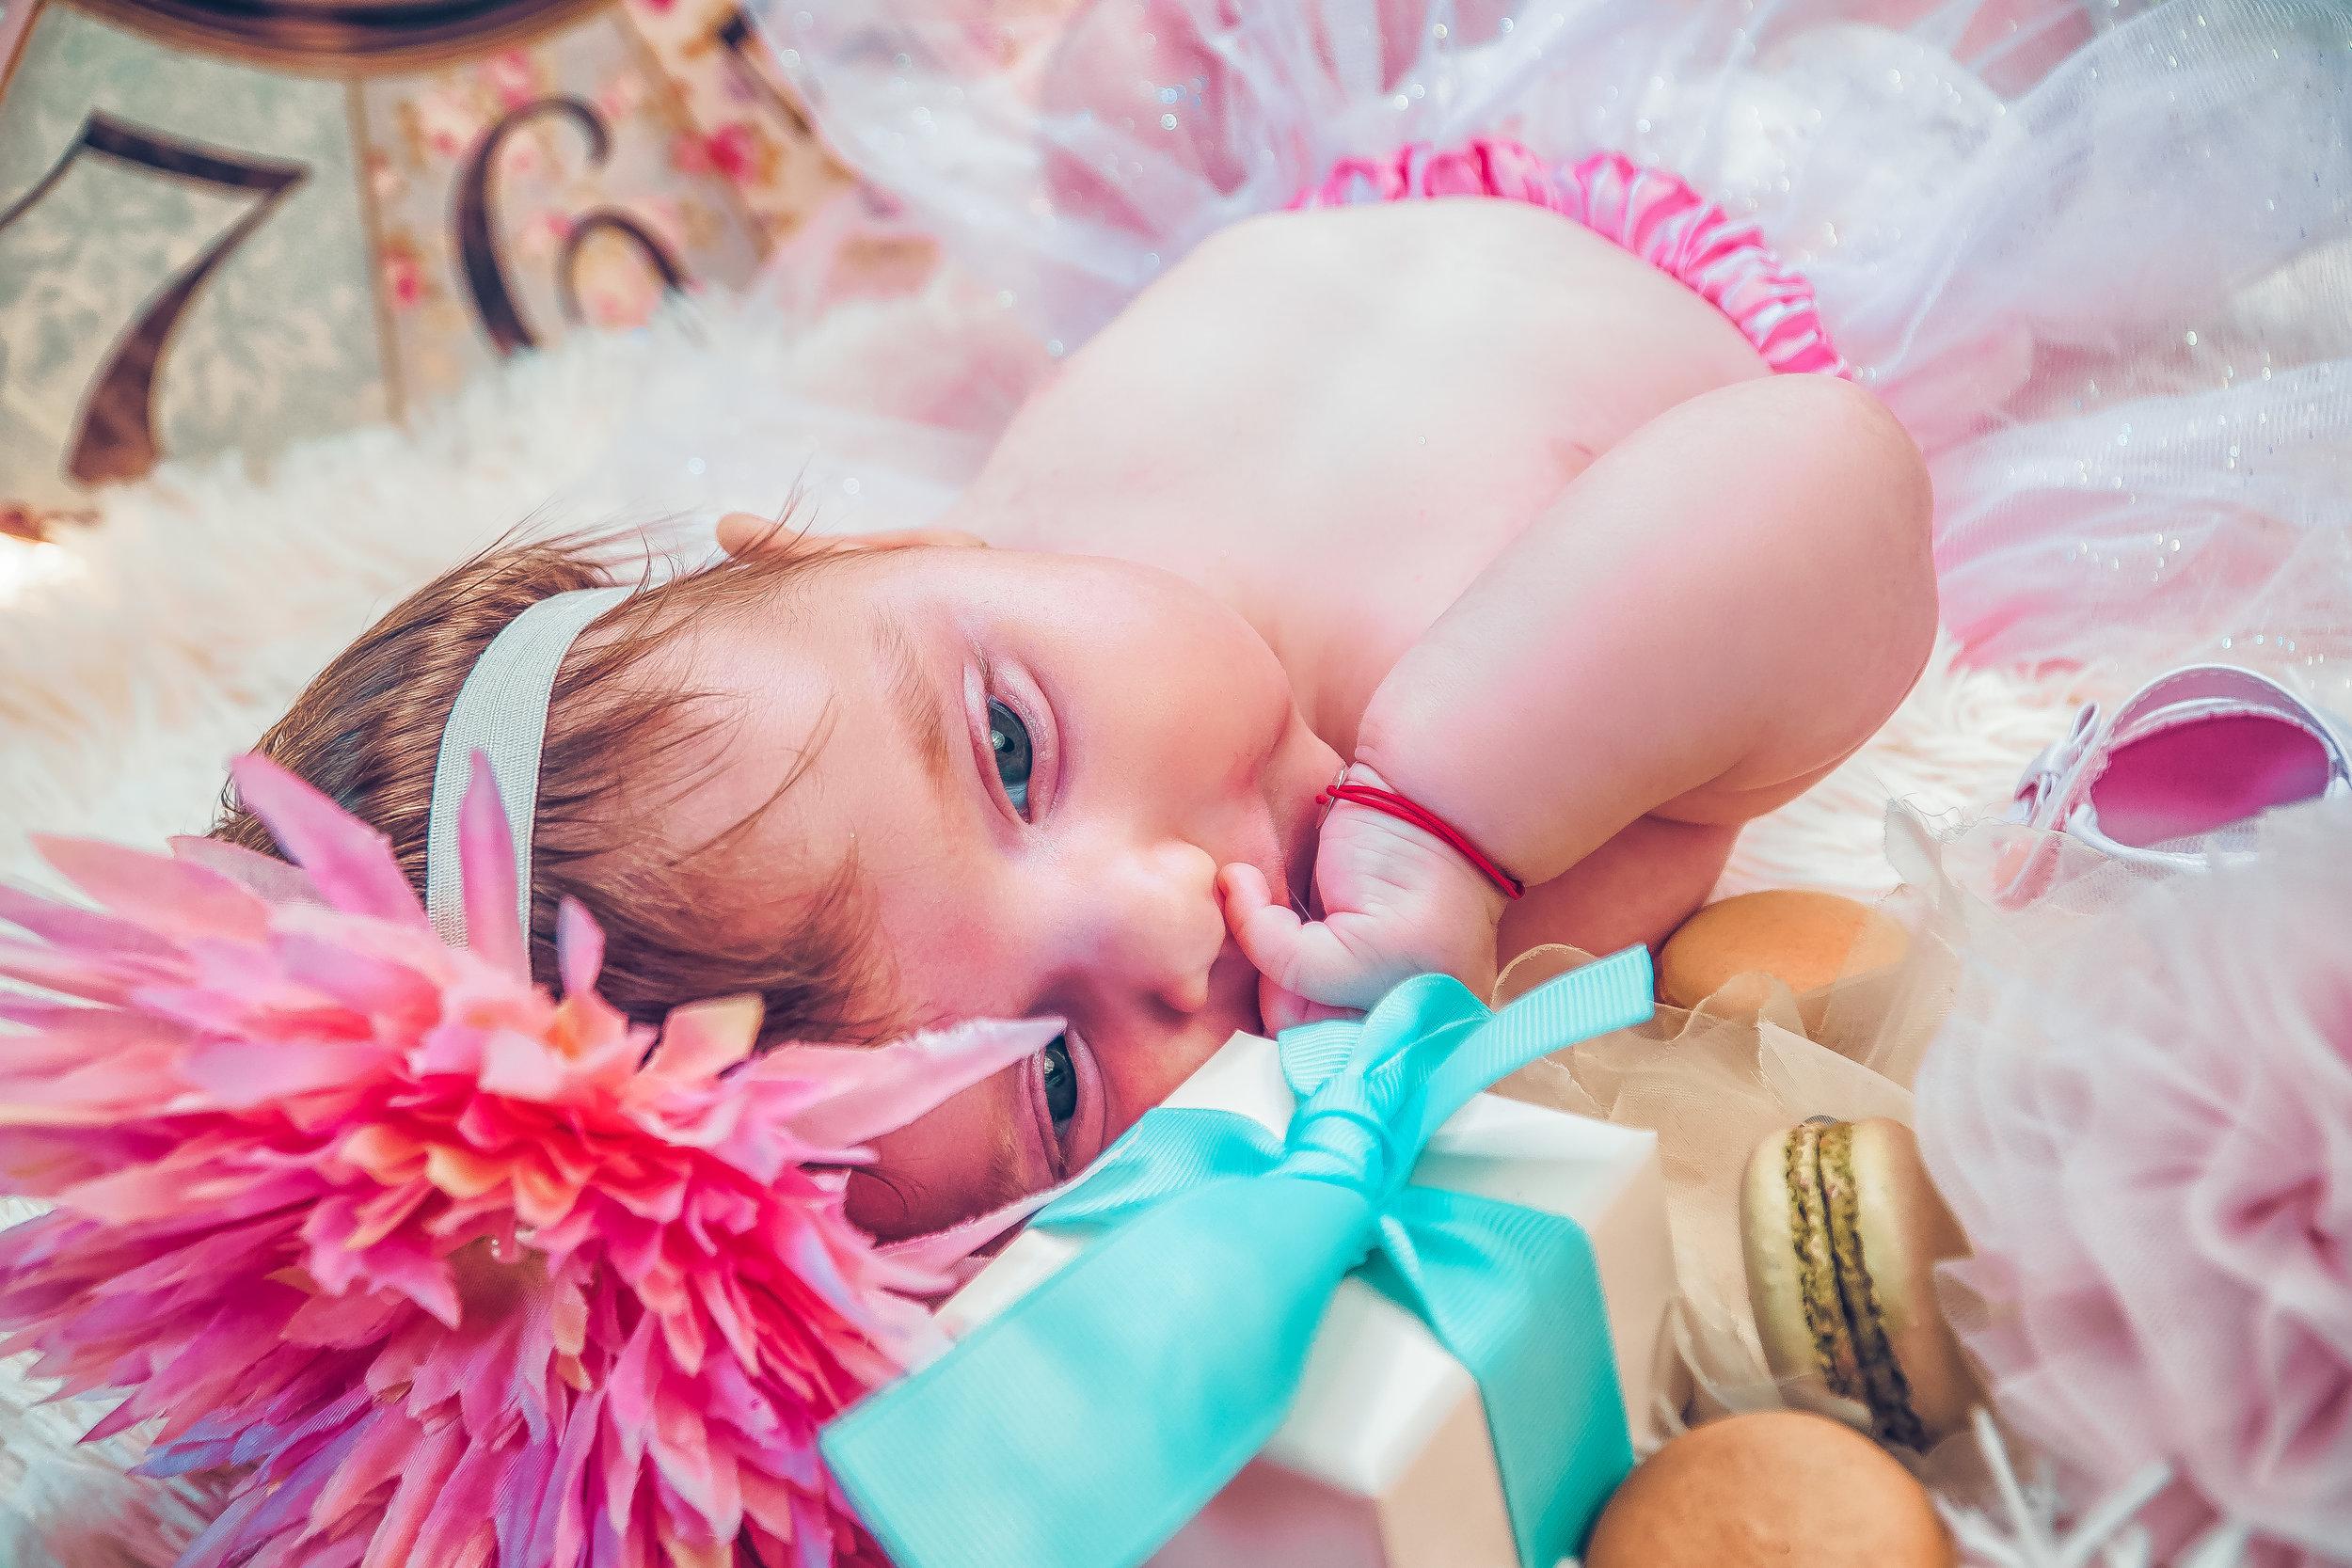 sedinta foto bebe copil crina popescu